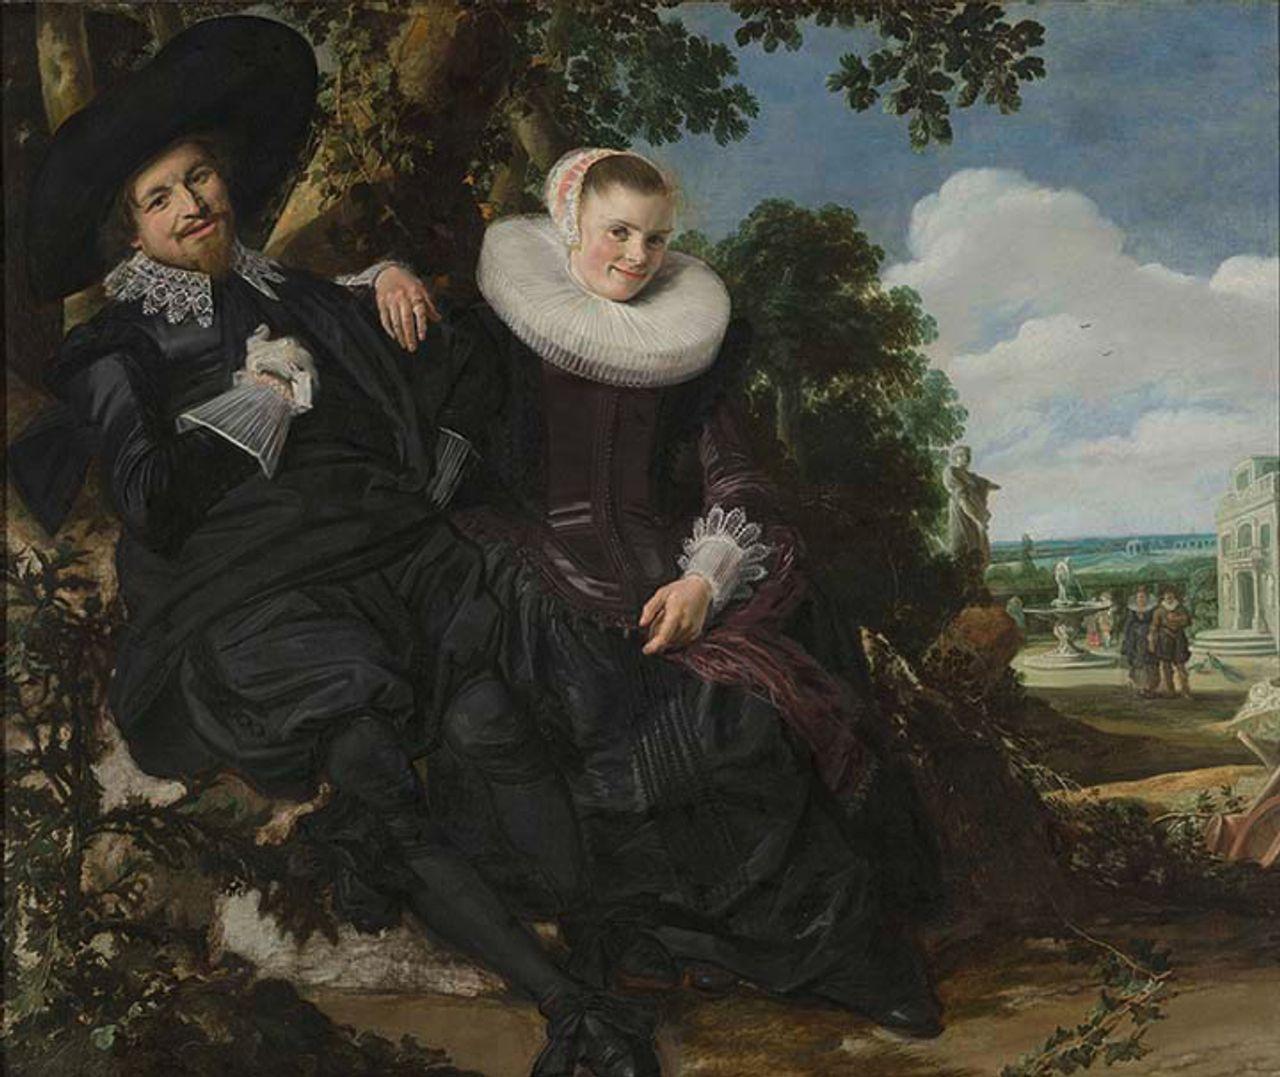 Frans Hals (Dutch, 1582/83–1666), Marriage Portrait of Isaac Massa and Beatrix van der Laen, ca. 1622, oil on canvas. 140 x 166.5 cm. Rijksmuseum, Amsterdam, inv. SK-A-133. ©Rijksmuseum, Amsterdam